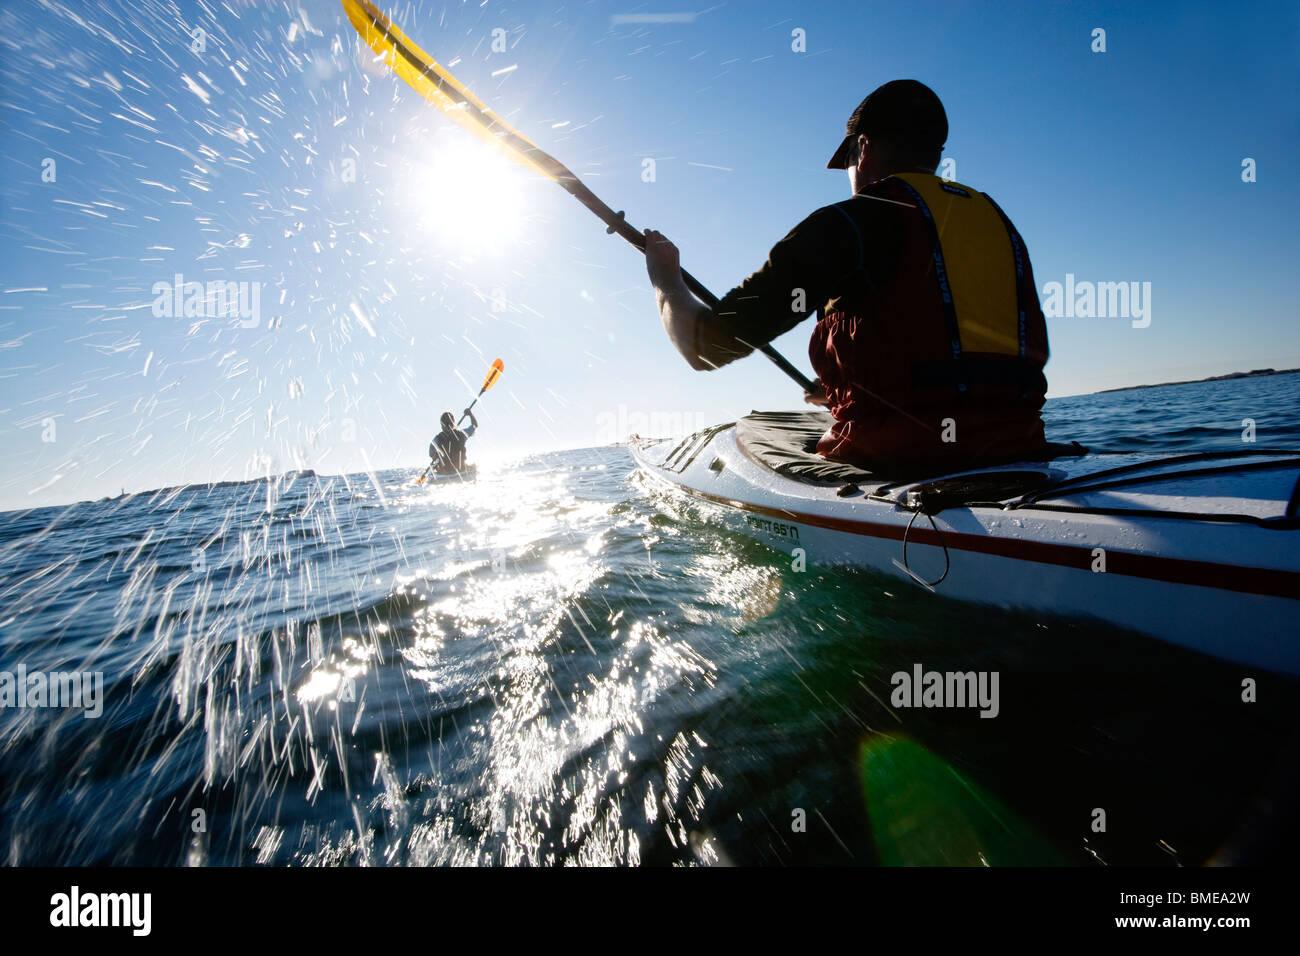 People kayaking, Sweden. - Stock Image